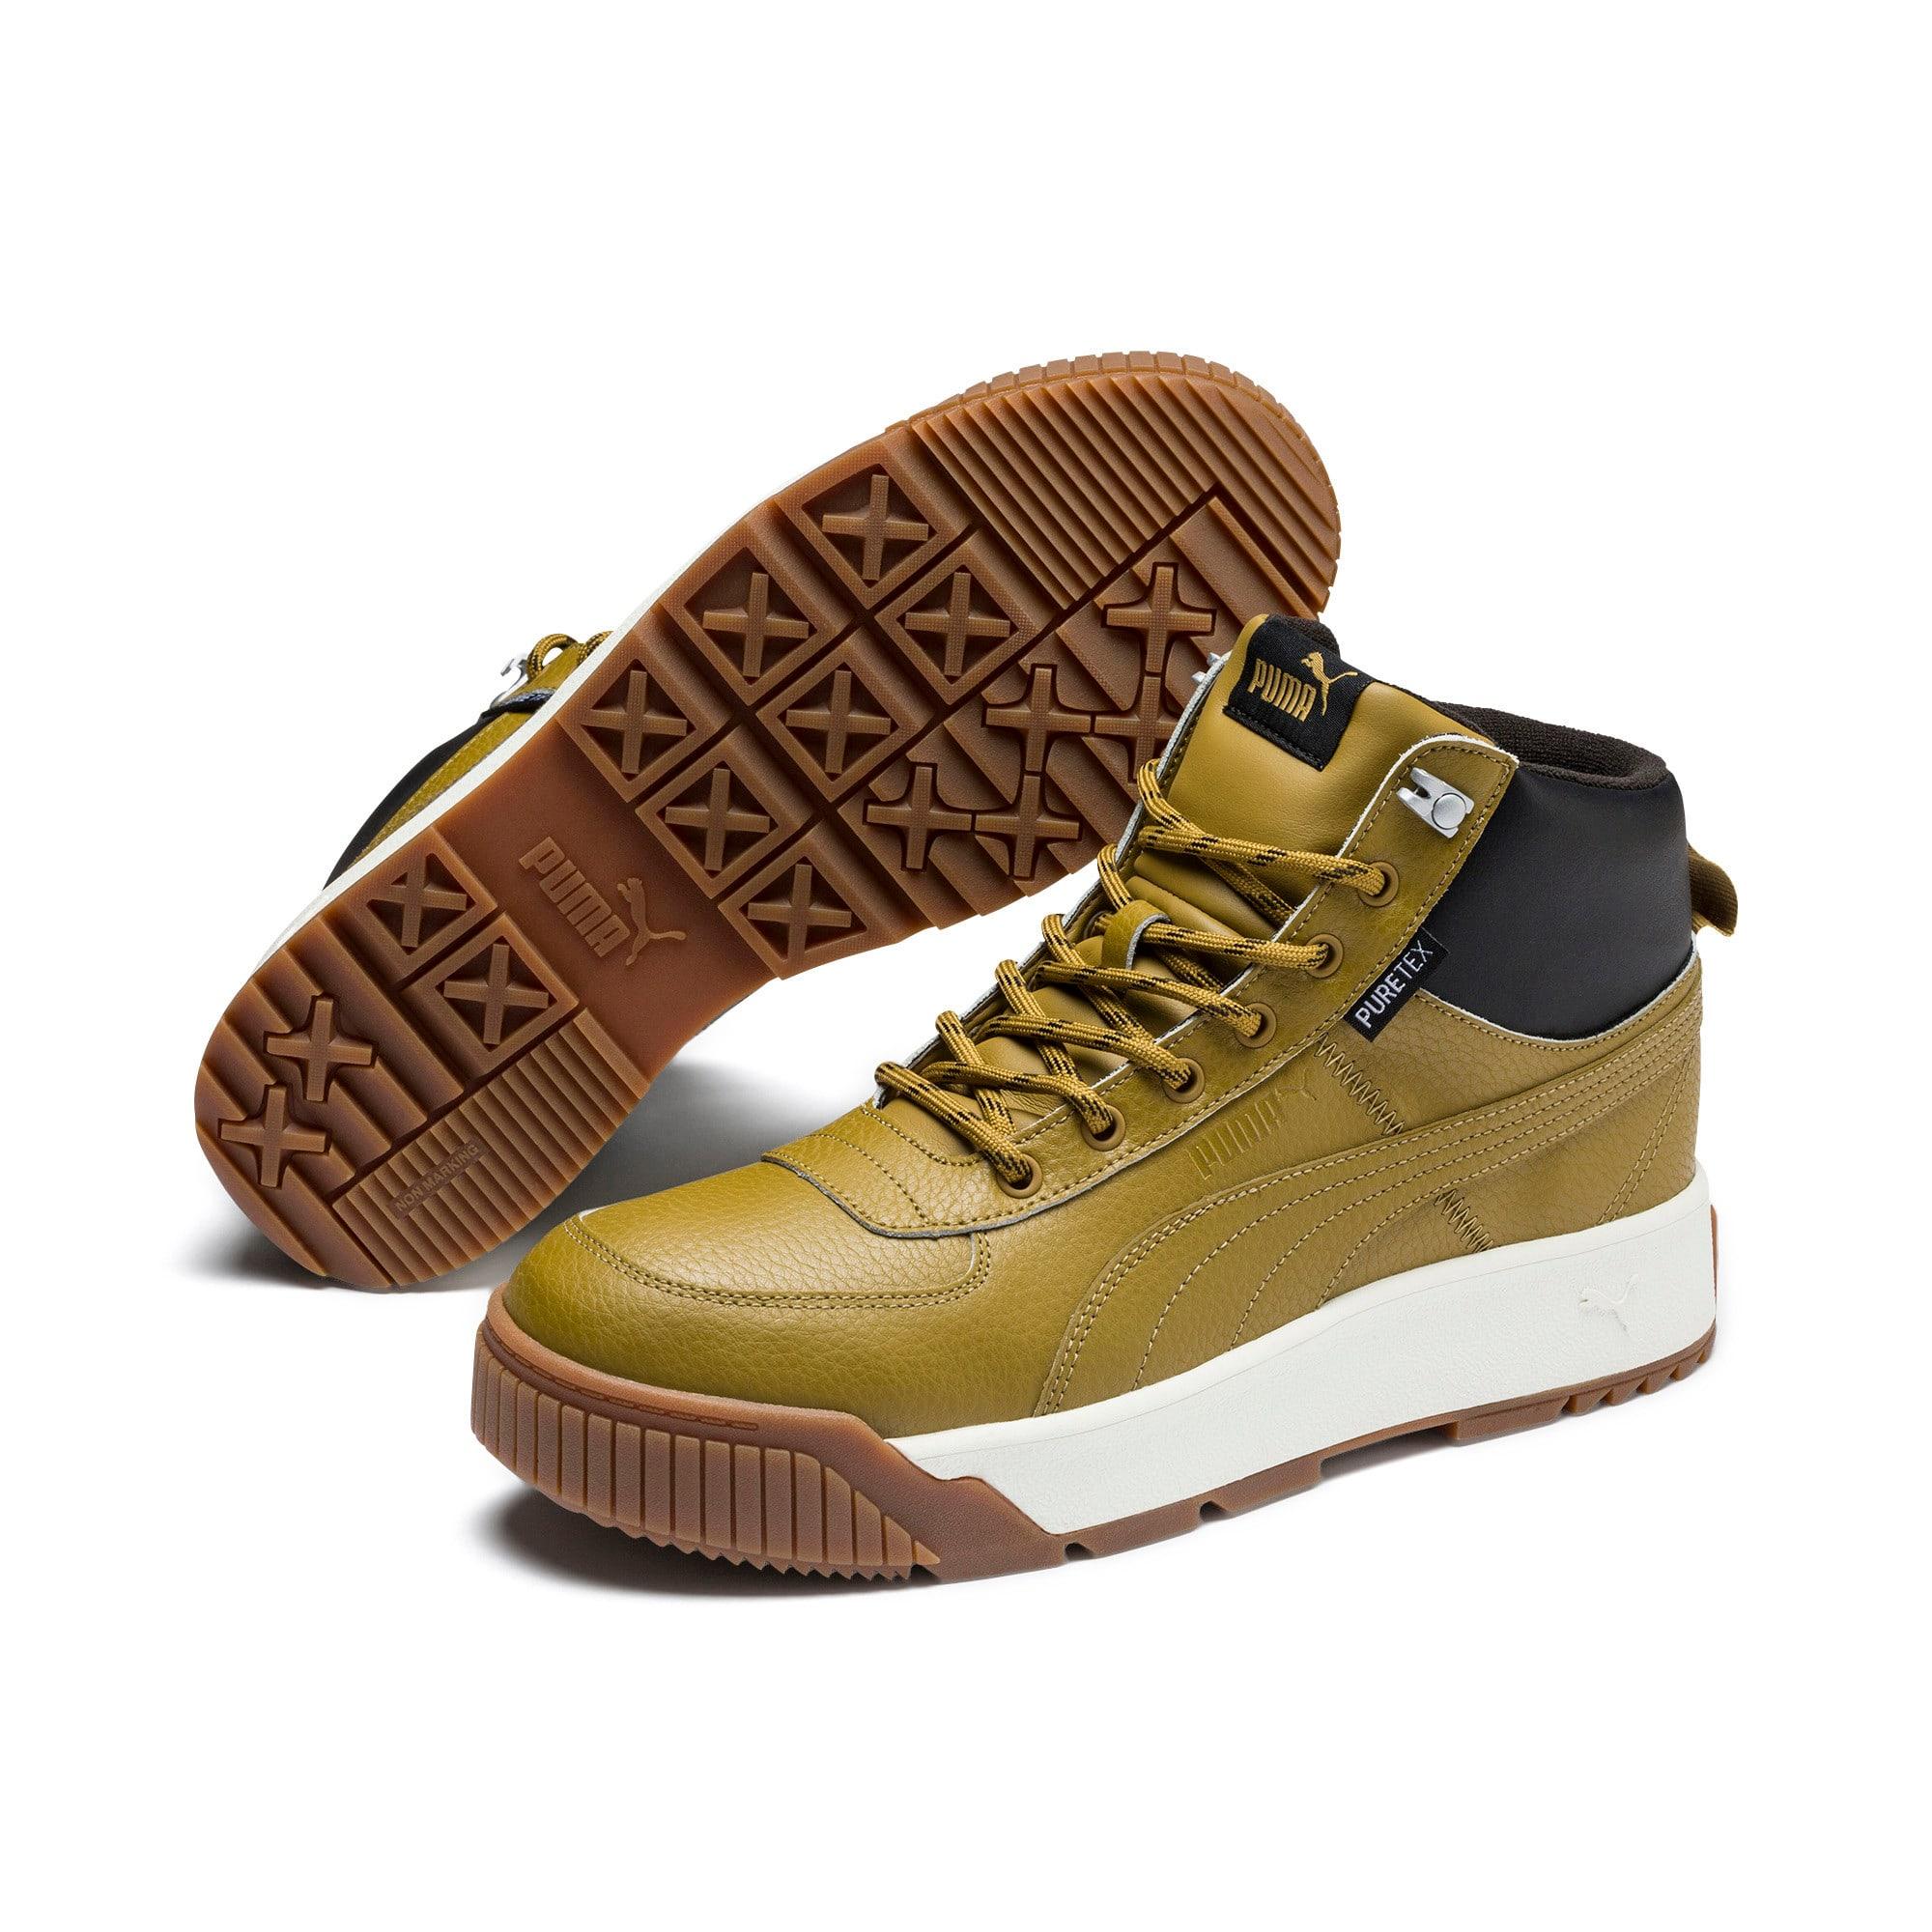 Thumbnail 3 of Tarrenz SB PURETEX Mid Sneakers, Moss Green-Puma Black, medium